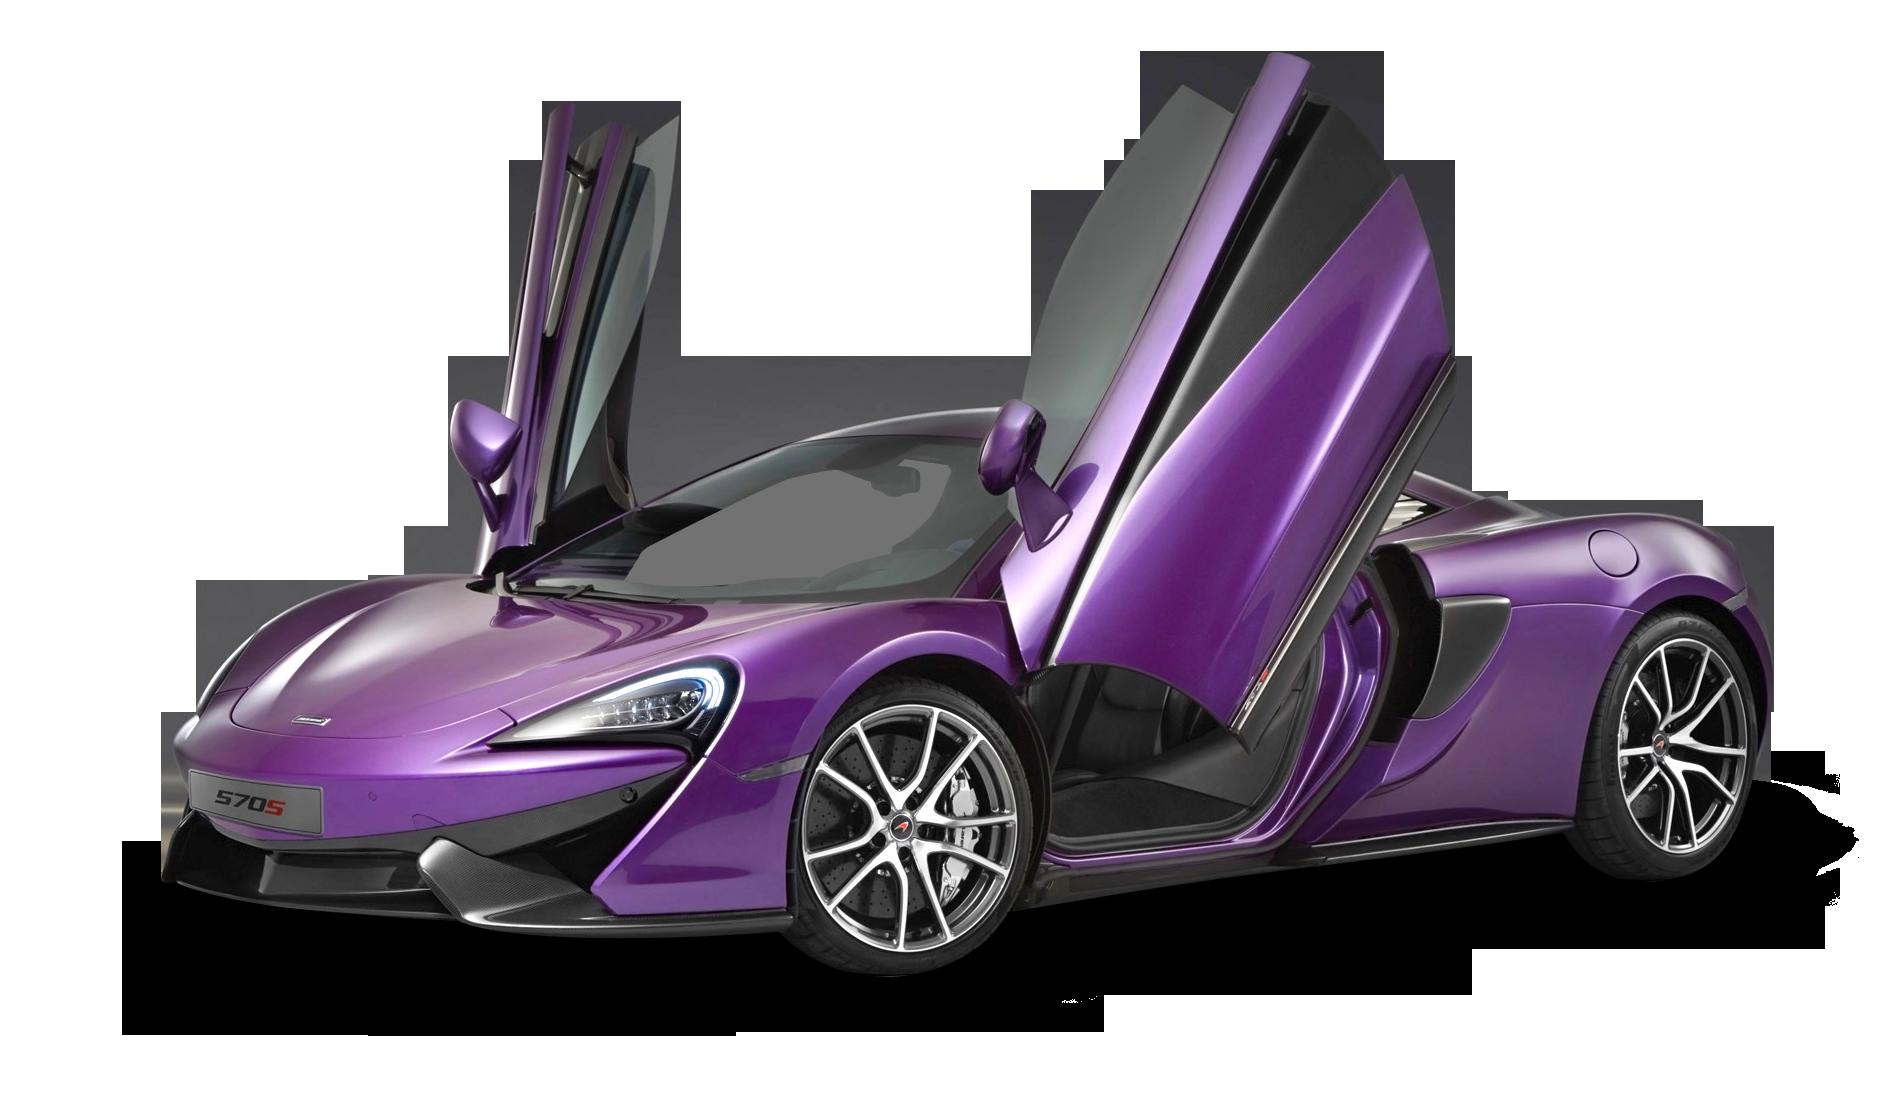 Violet McLaren 570s Car